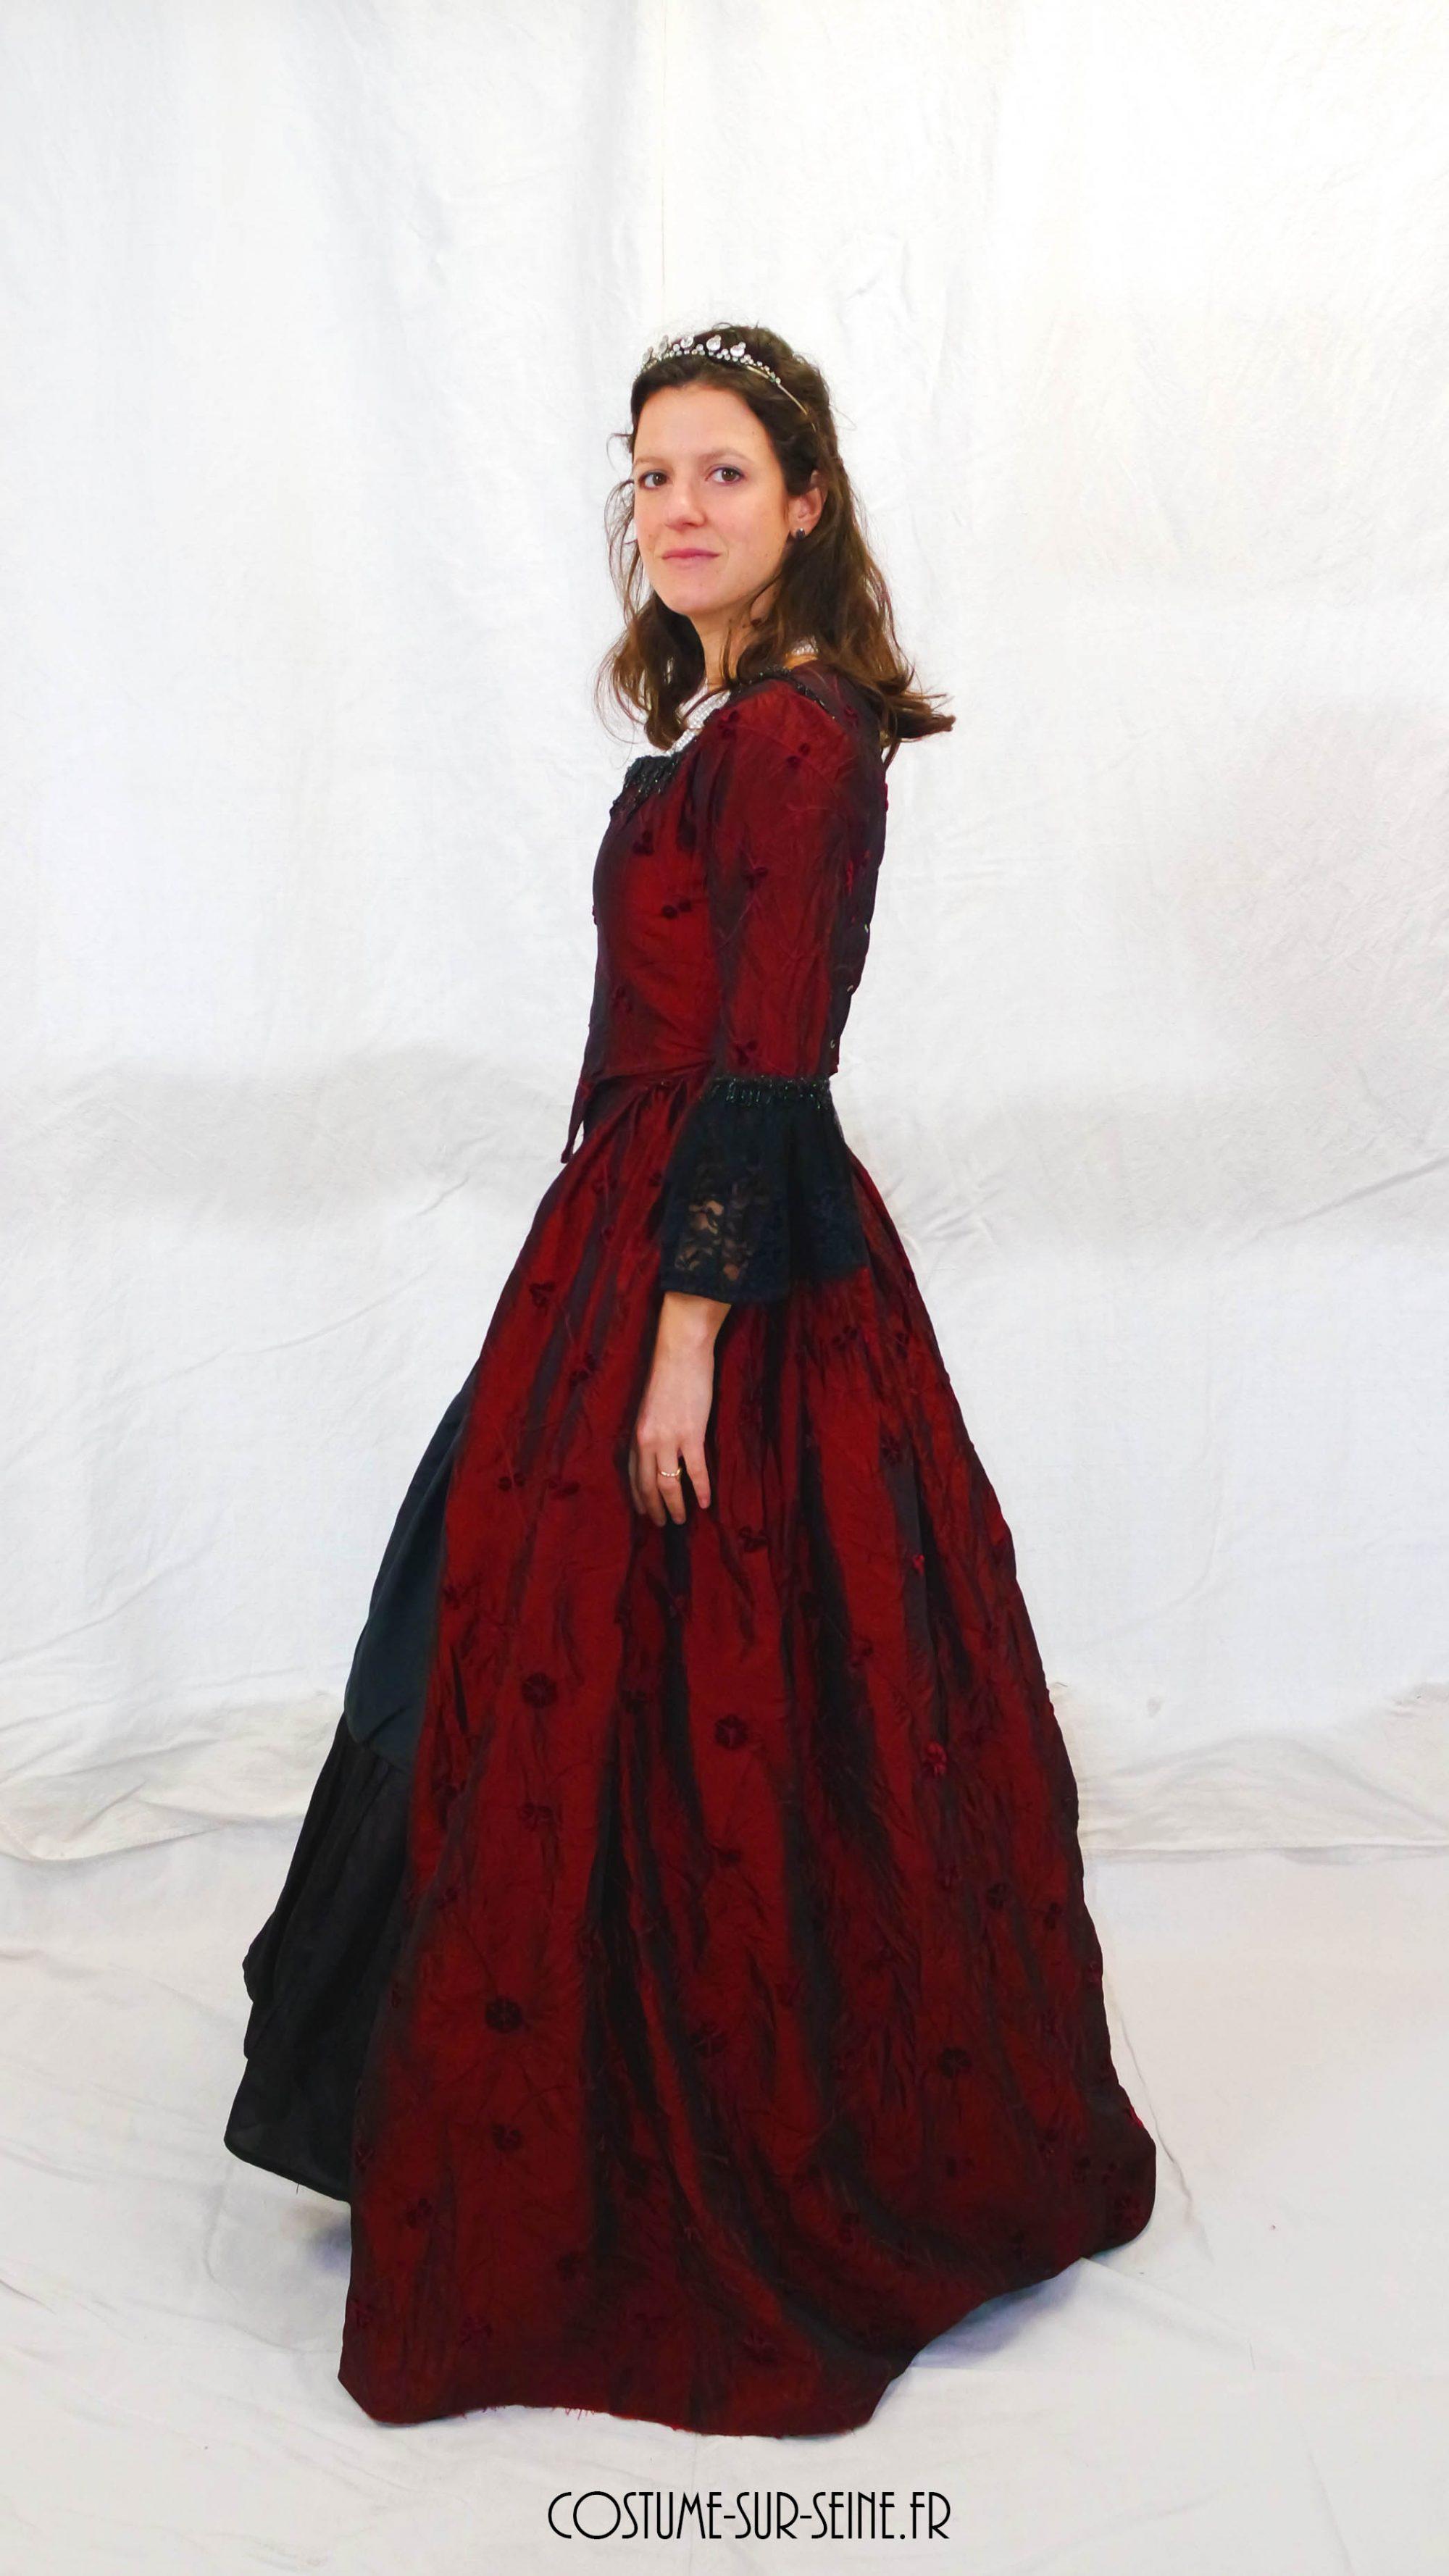 robe XVIIIe rouge et noir profil